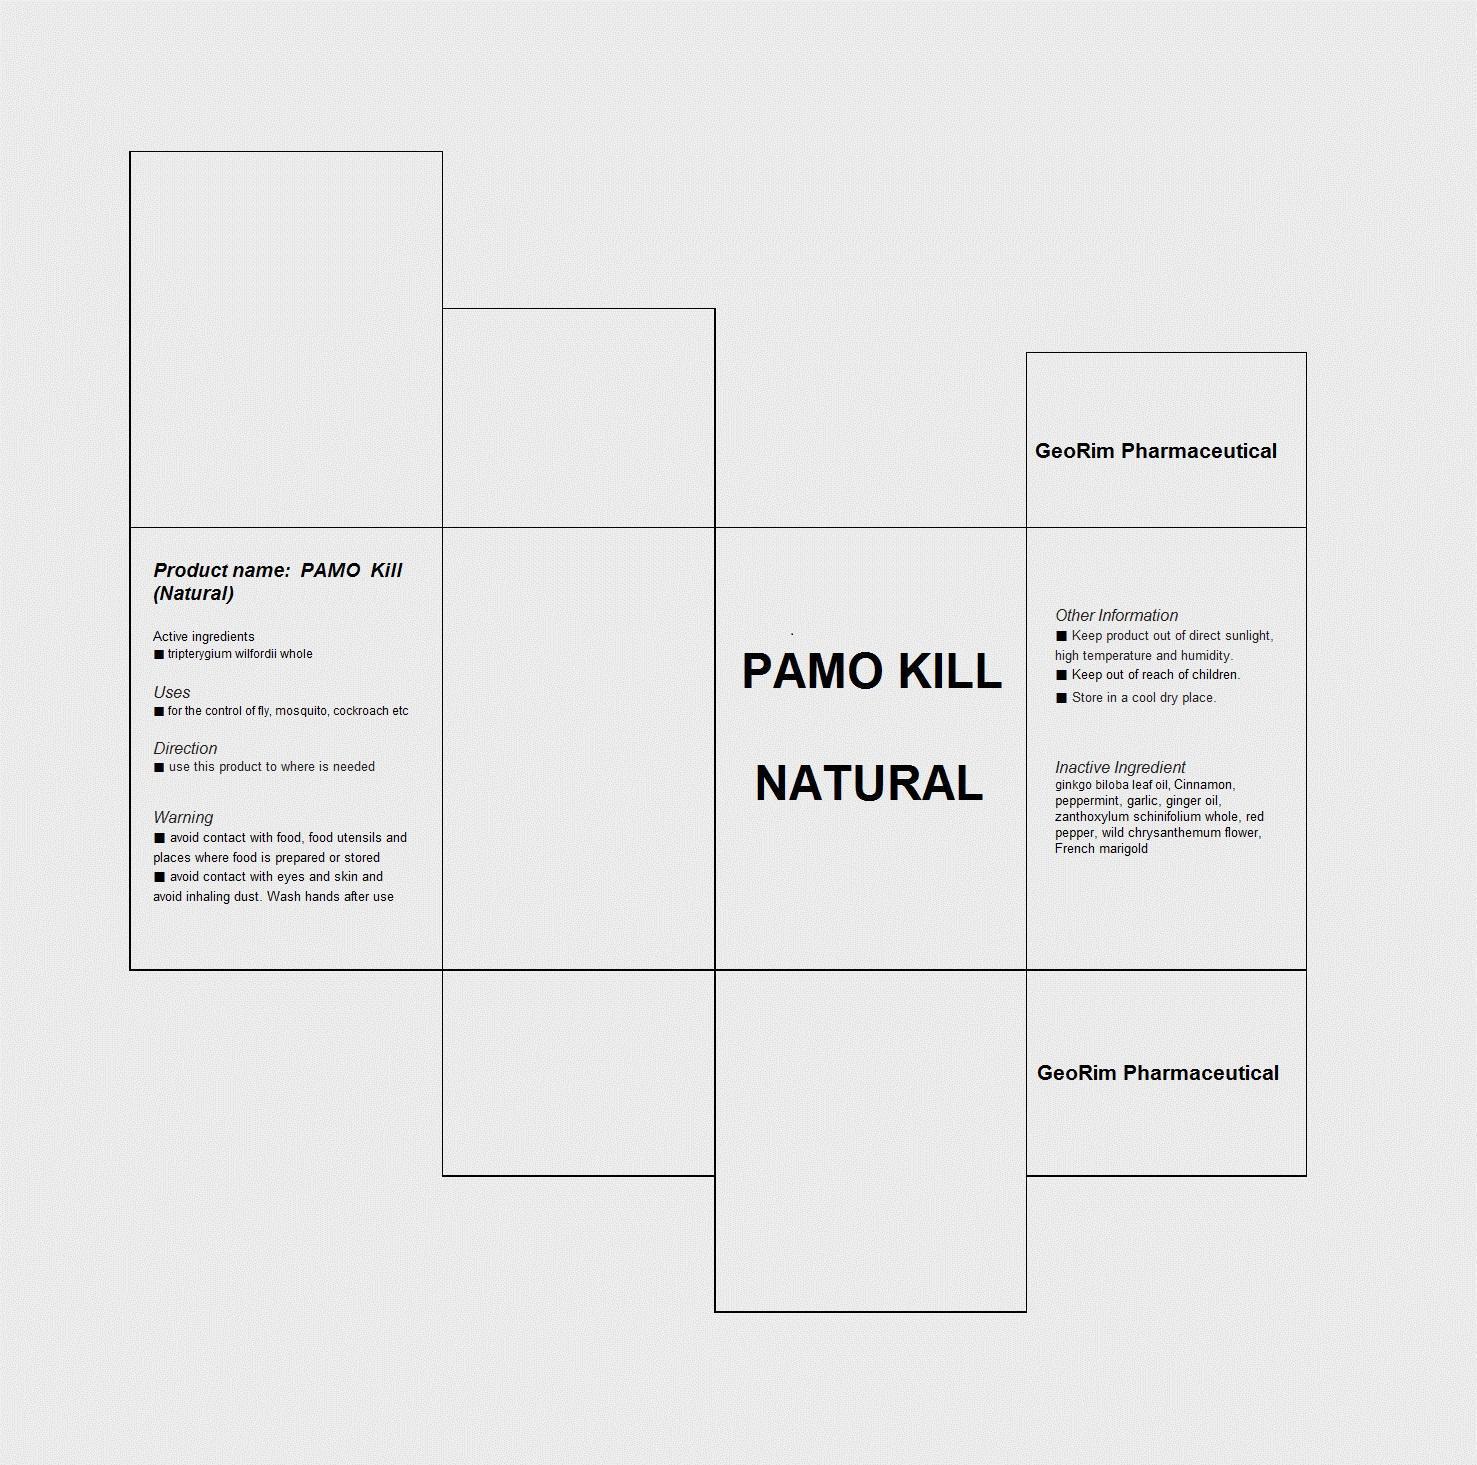 Pamo Kill Natural (Tripterygium Wilfordii Whole) Liquid [Georim Pharmaceutical]